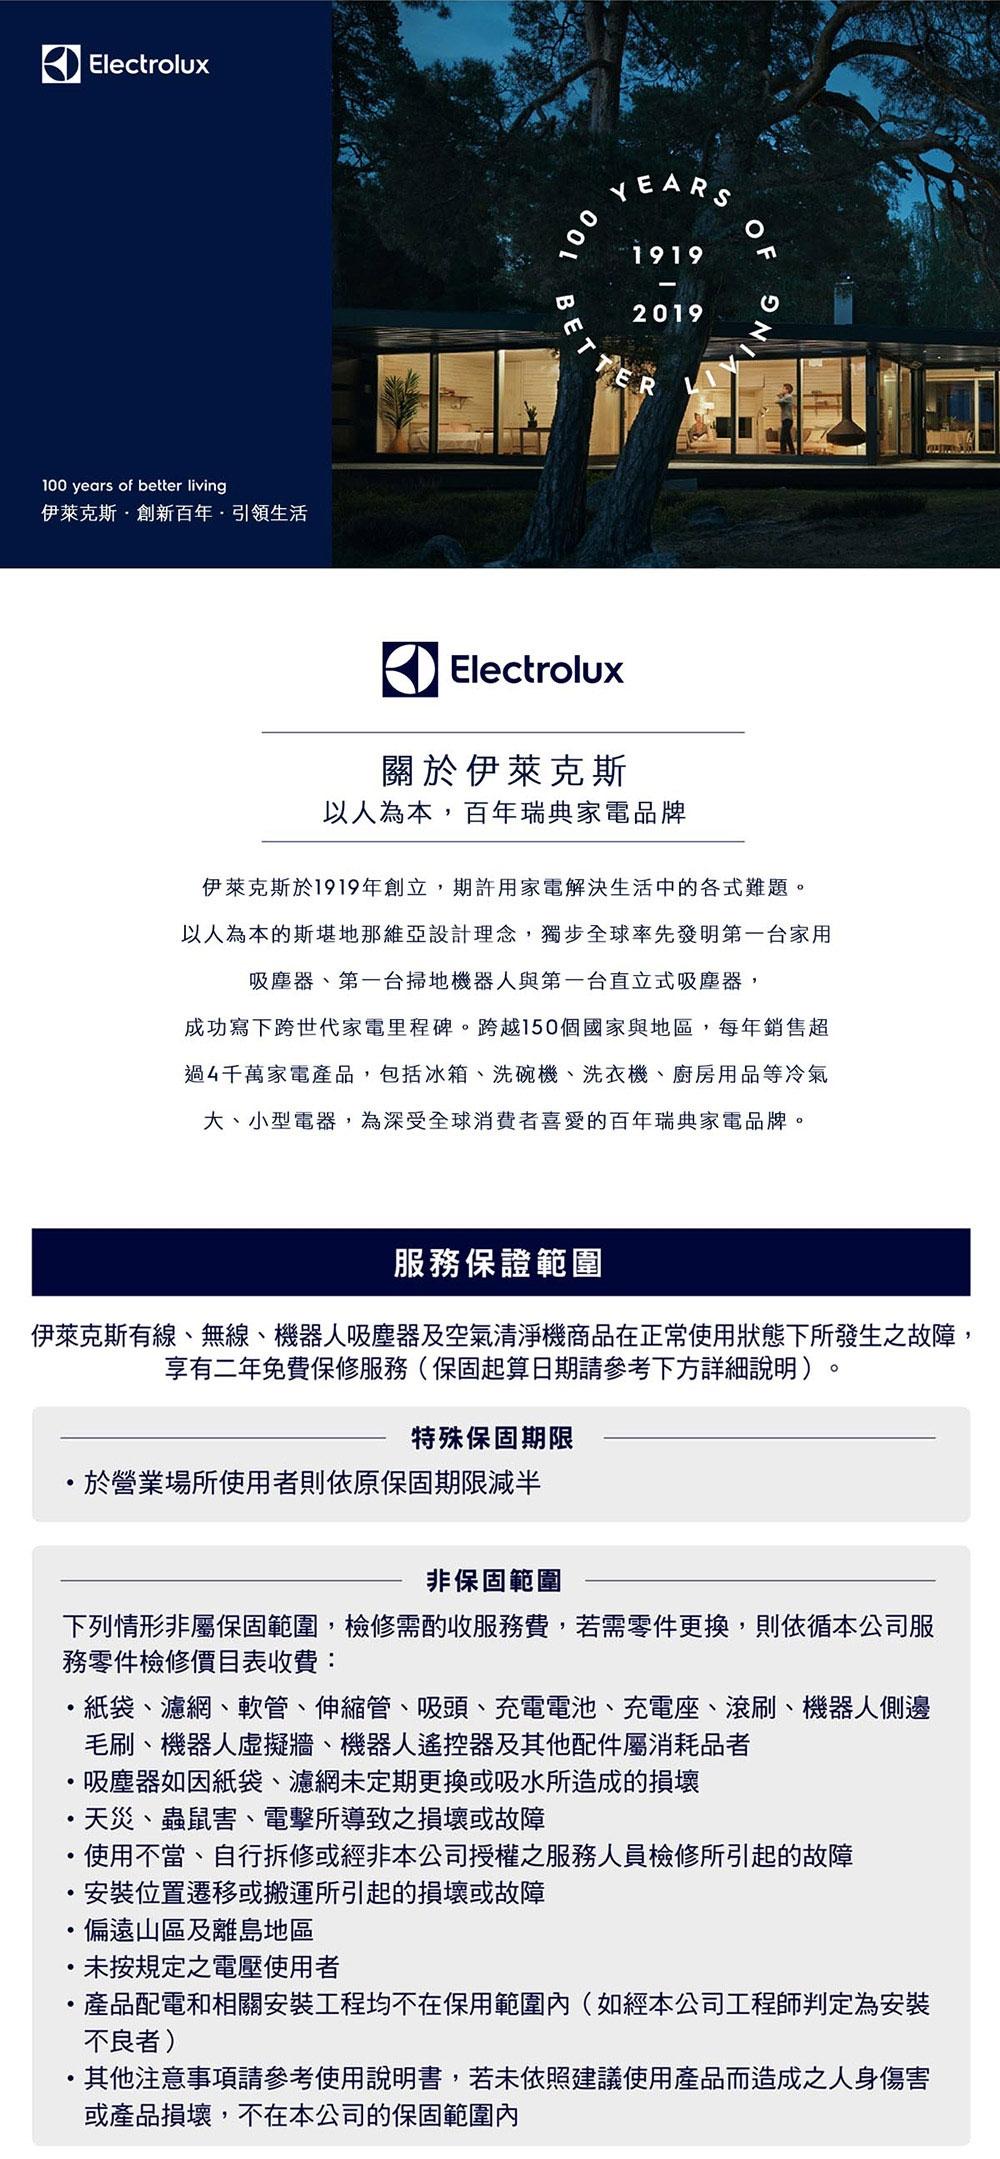 Electrolux 伊萊克斯新一代完美管家HEPA進化版ZB3501EB